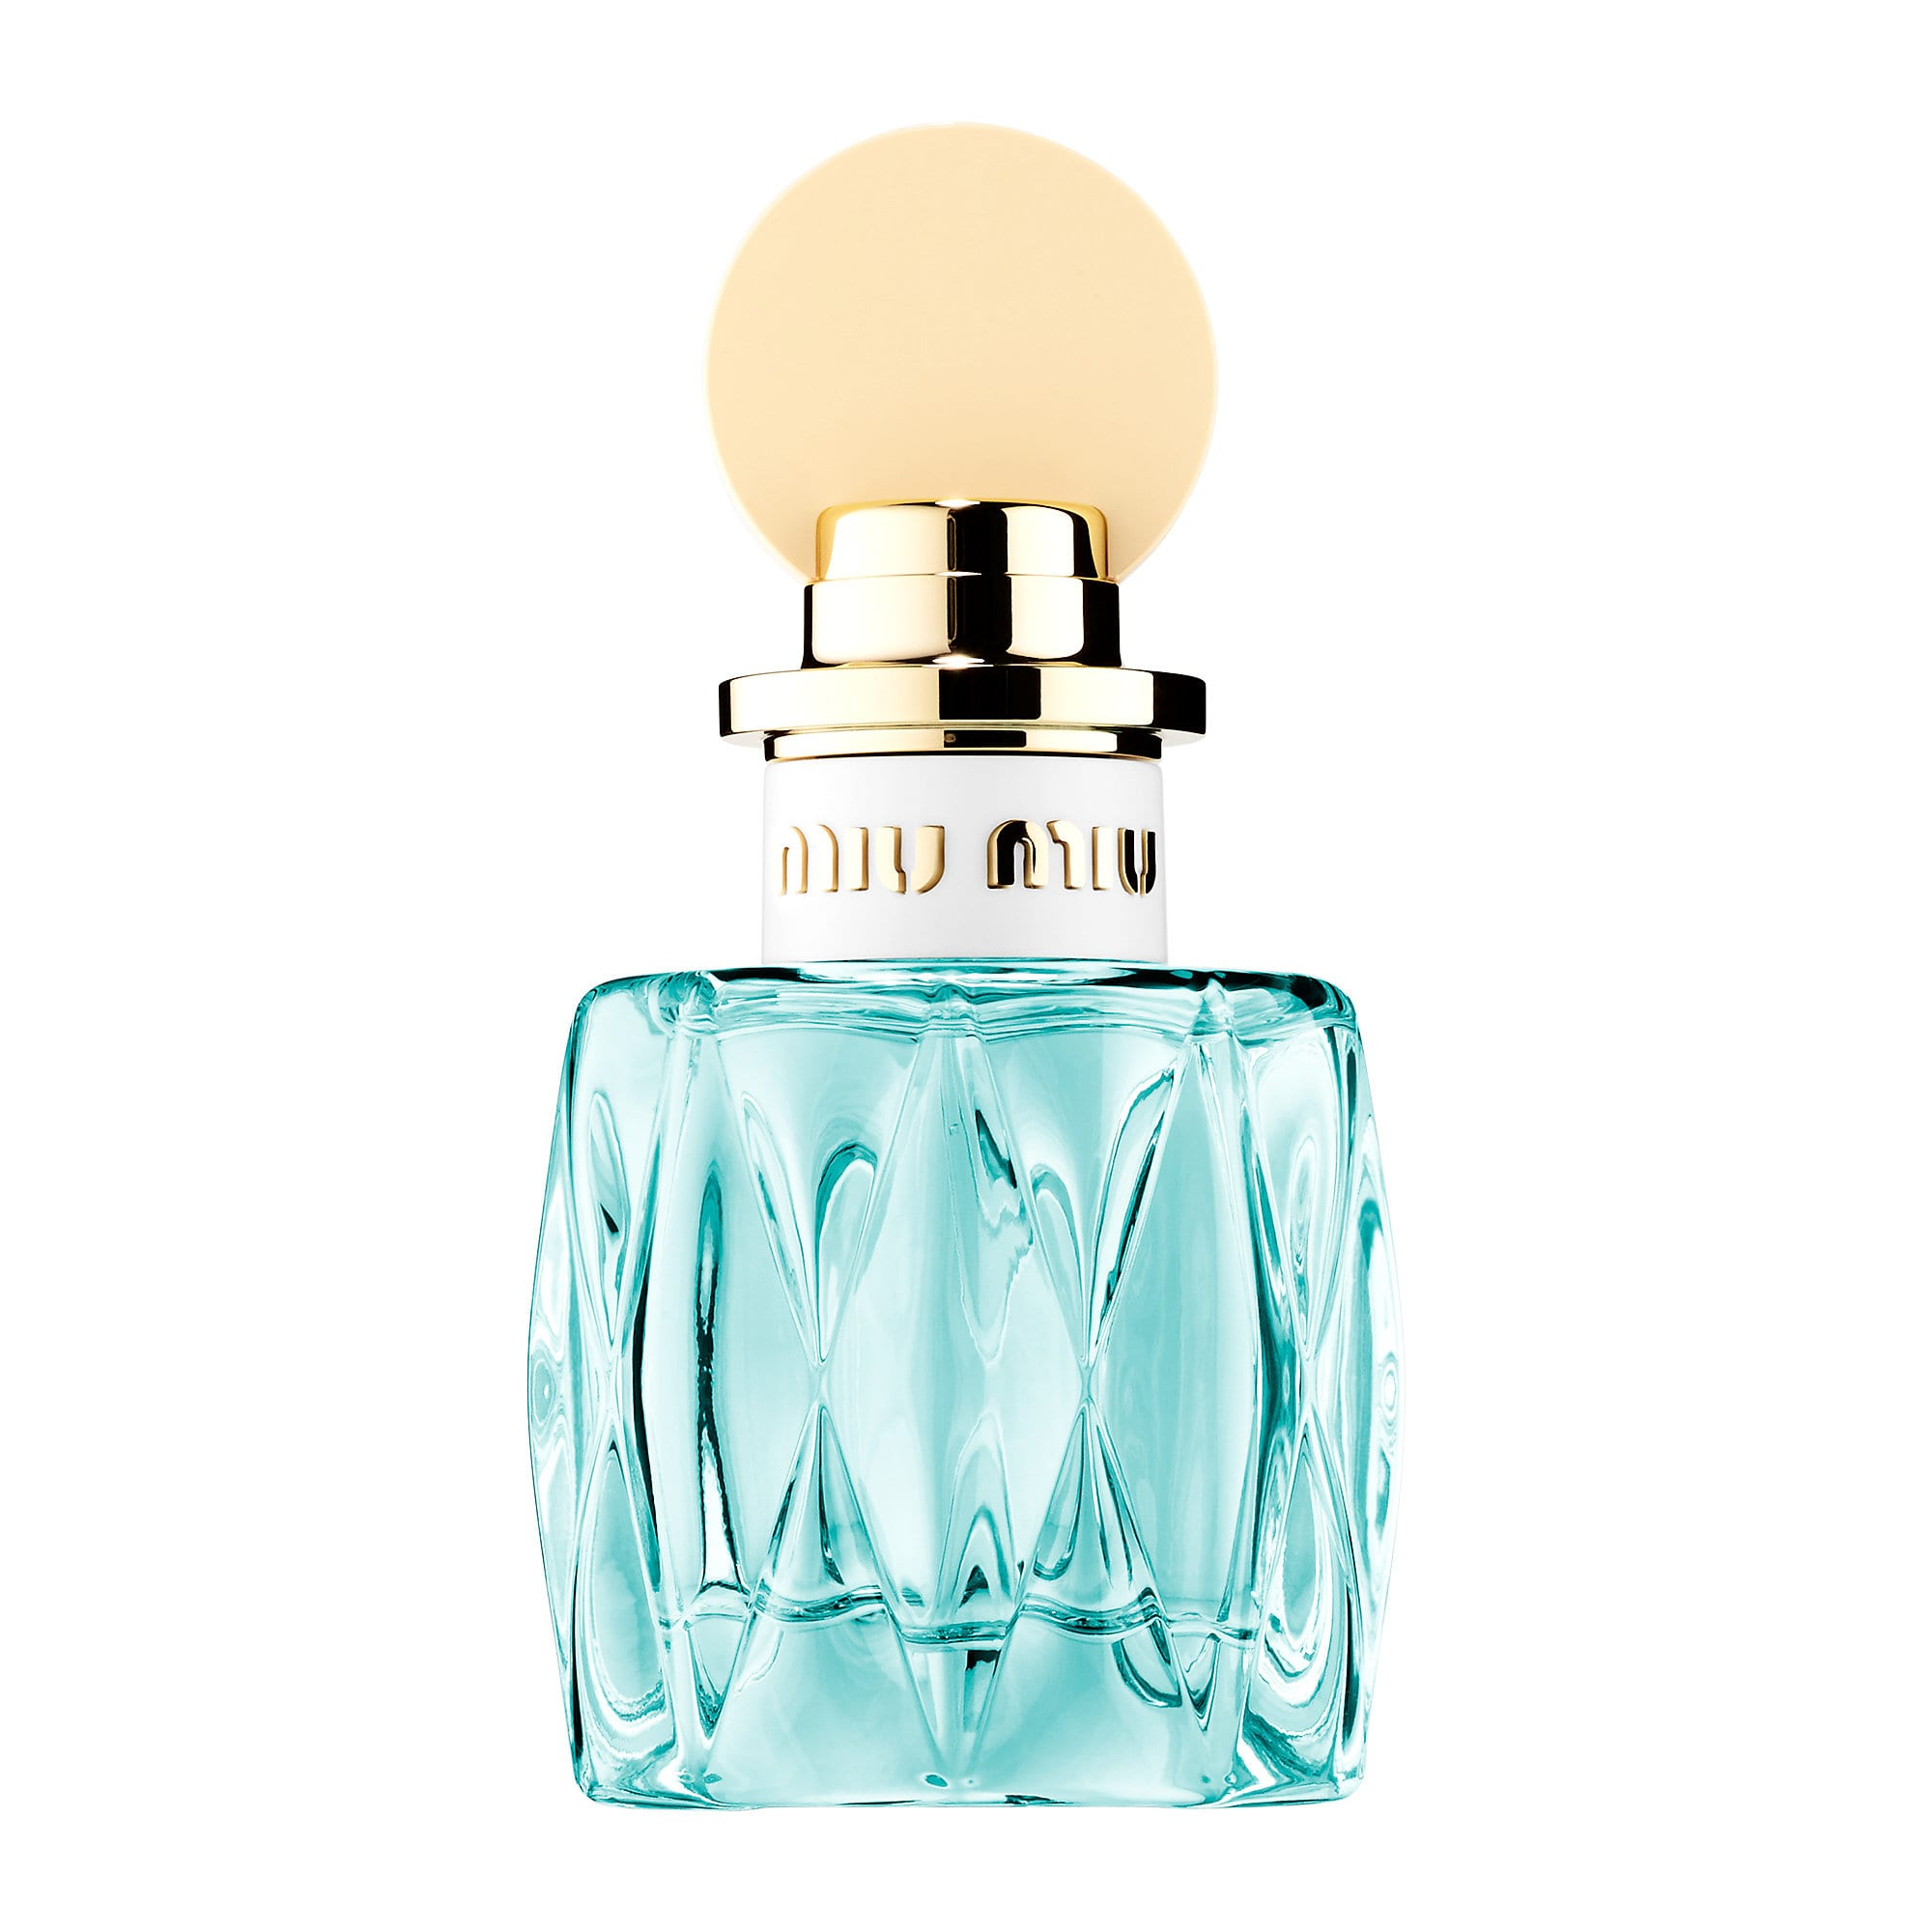 1 Oz Parfum Eau L'eau In 7 50 Bleue Miu Spray De Ml 2HIYDWE9